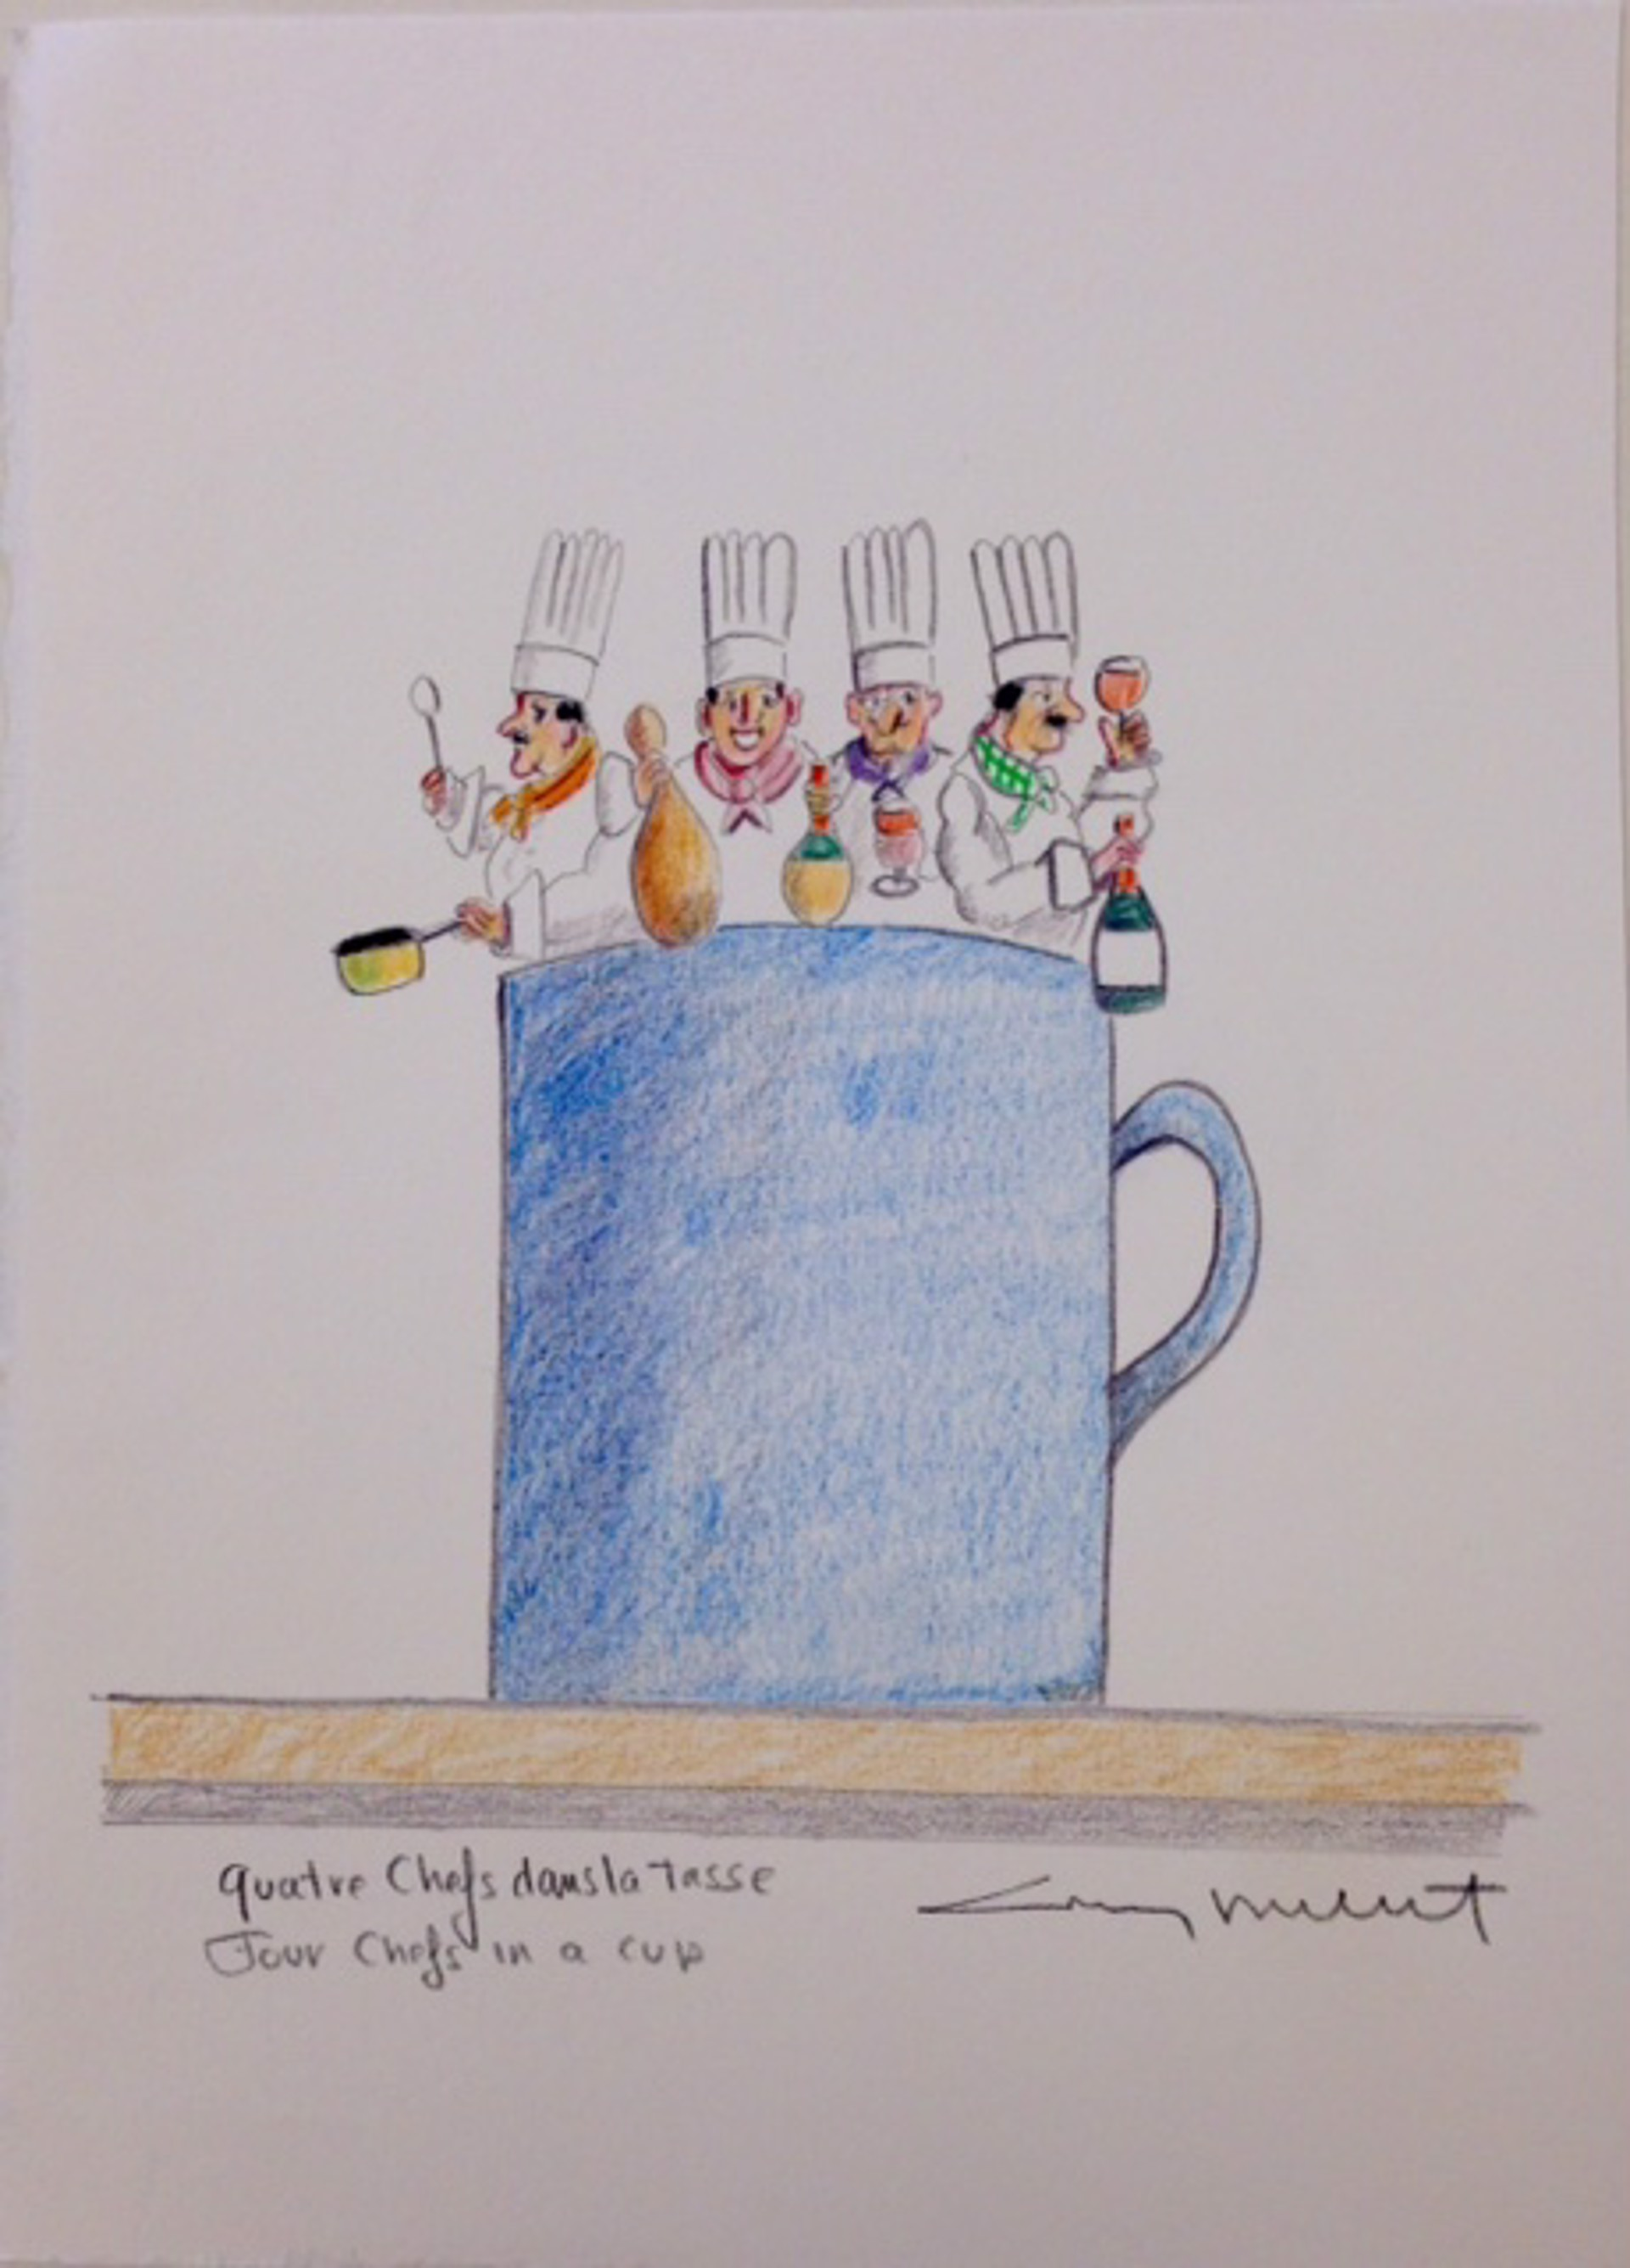 Quatre Chefs Dansla Tasse by Guy Buffet